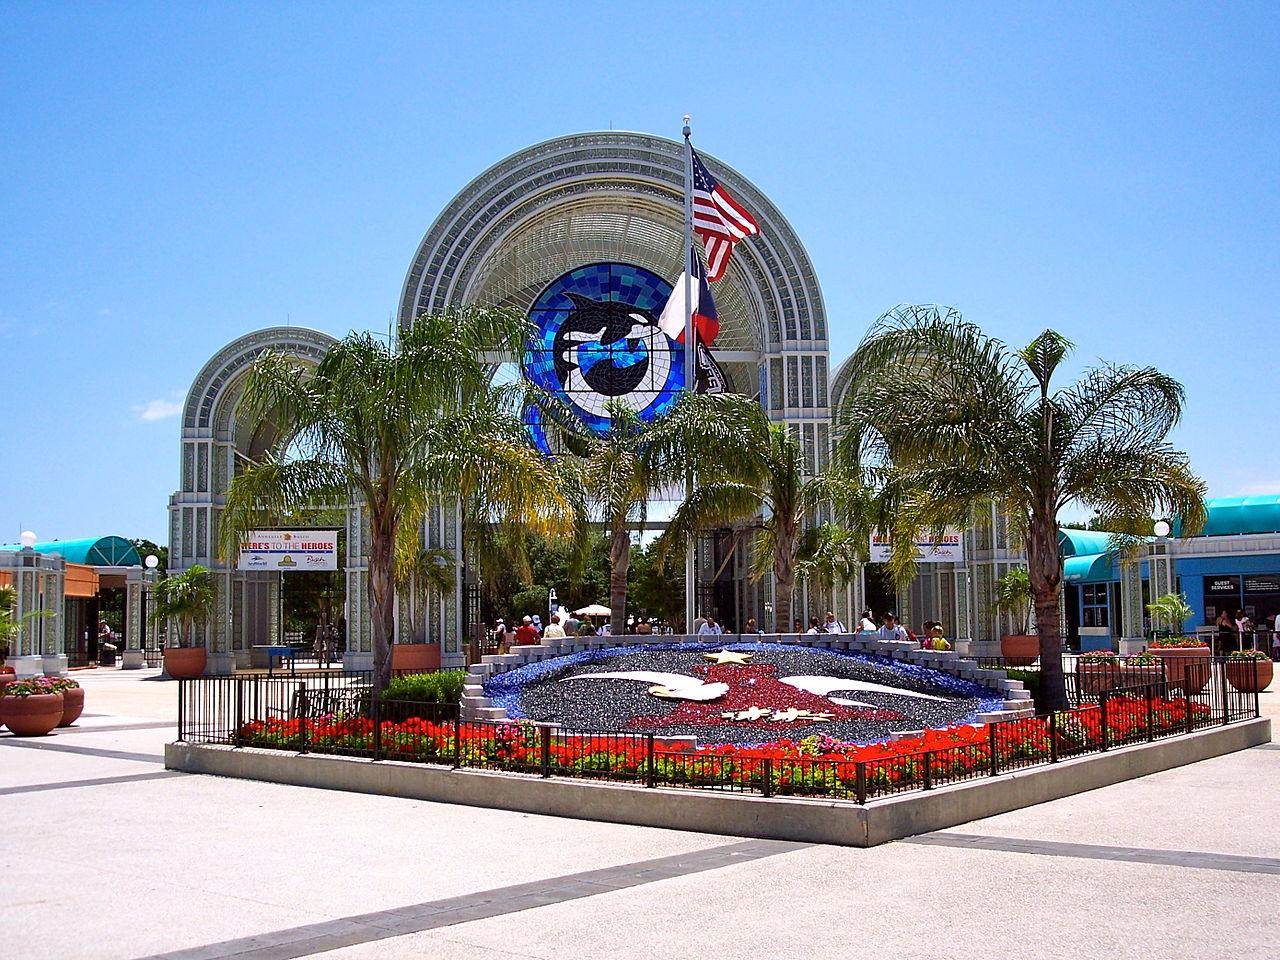 File Entrance to Sea World San Antonio Texas June 4 2007 JPG Wikimedia